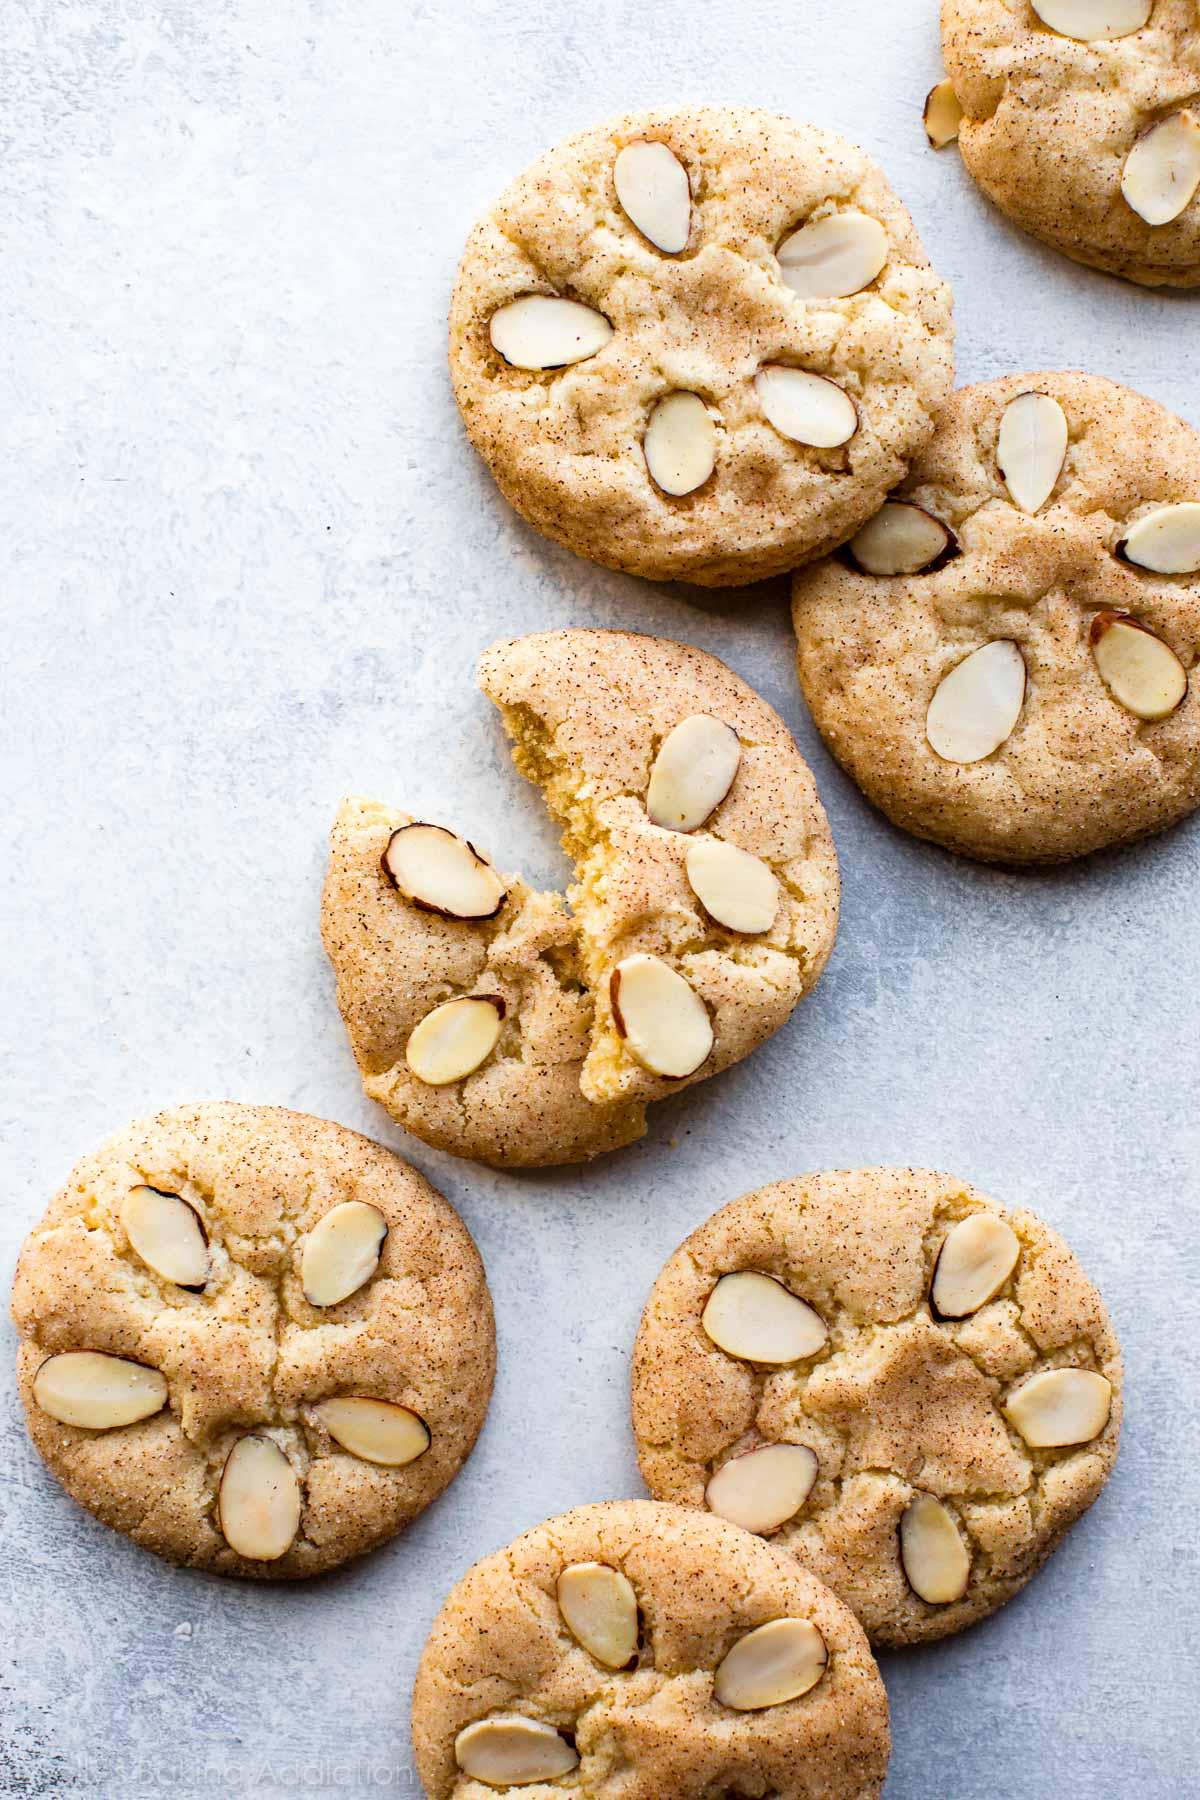 Sweet cinnamon sugar cookies topped with sliced almonds to make adorable little beach sand dollars! Recipe on sallysbakingaddiction.com